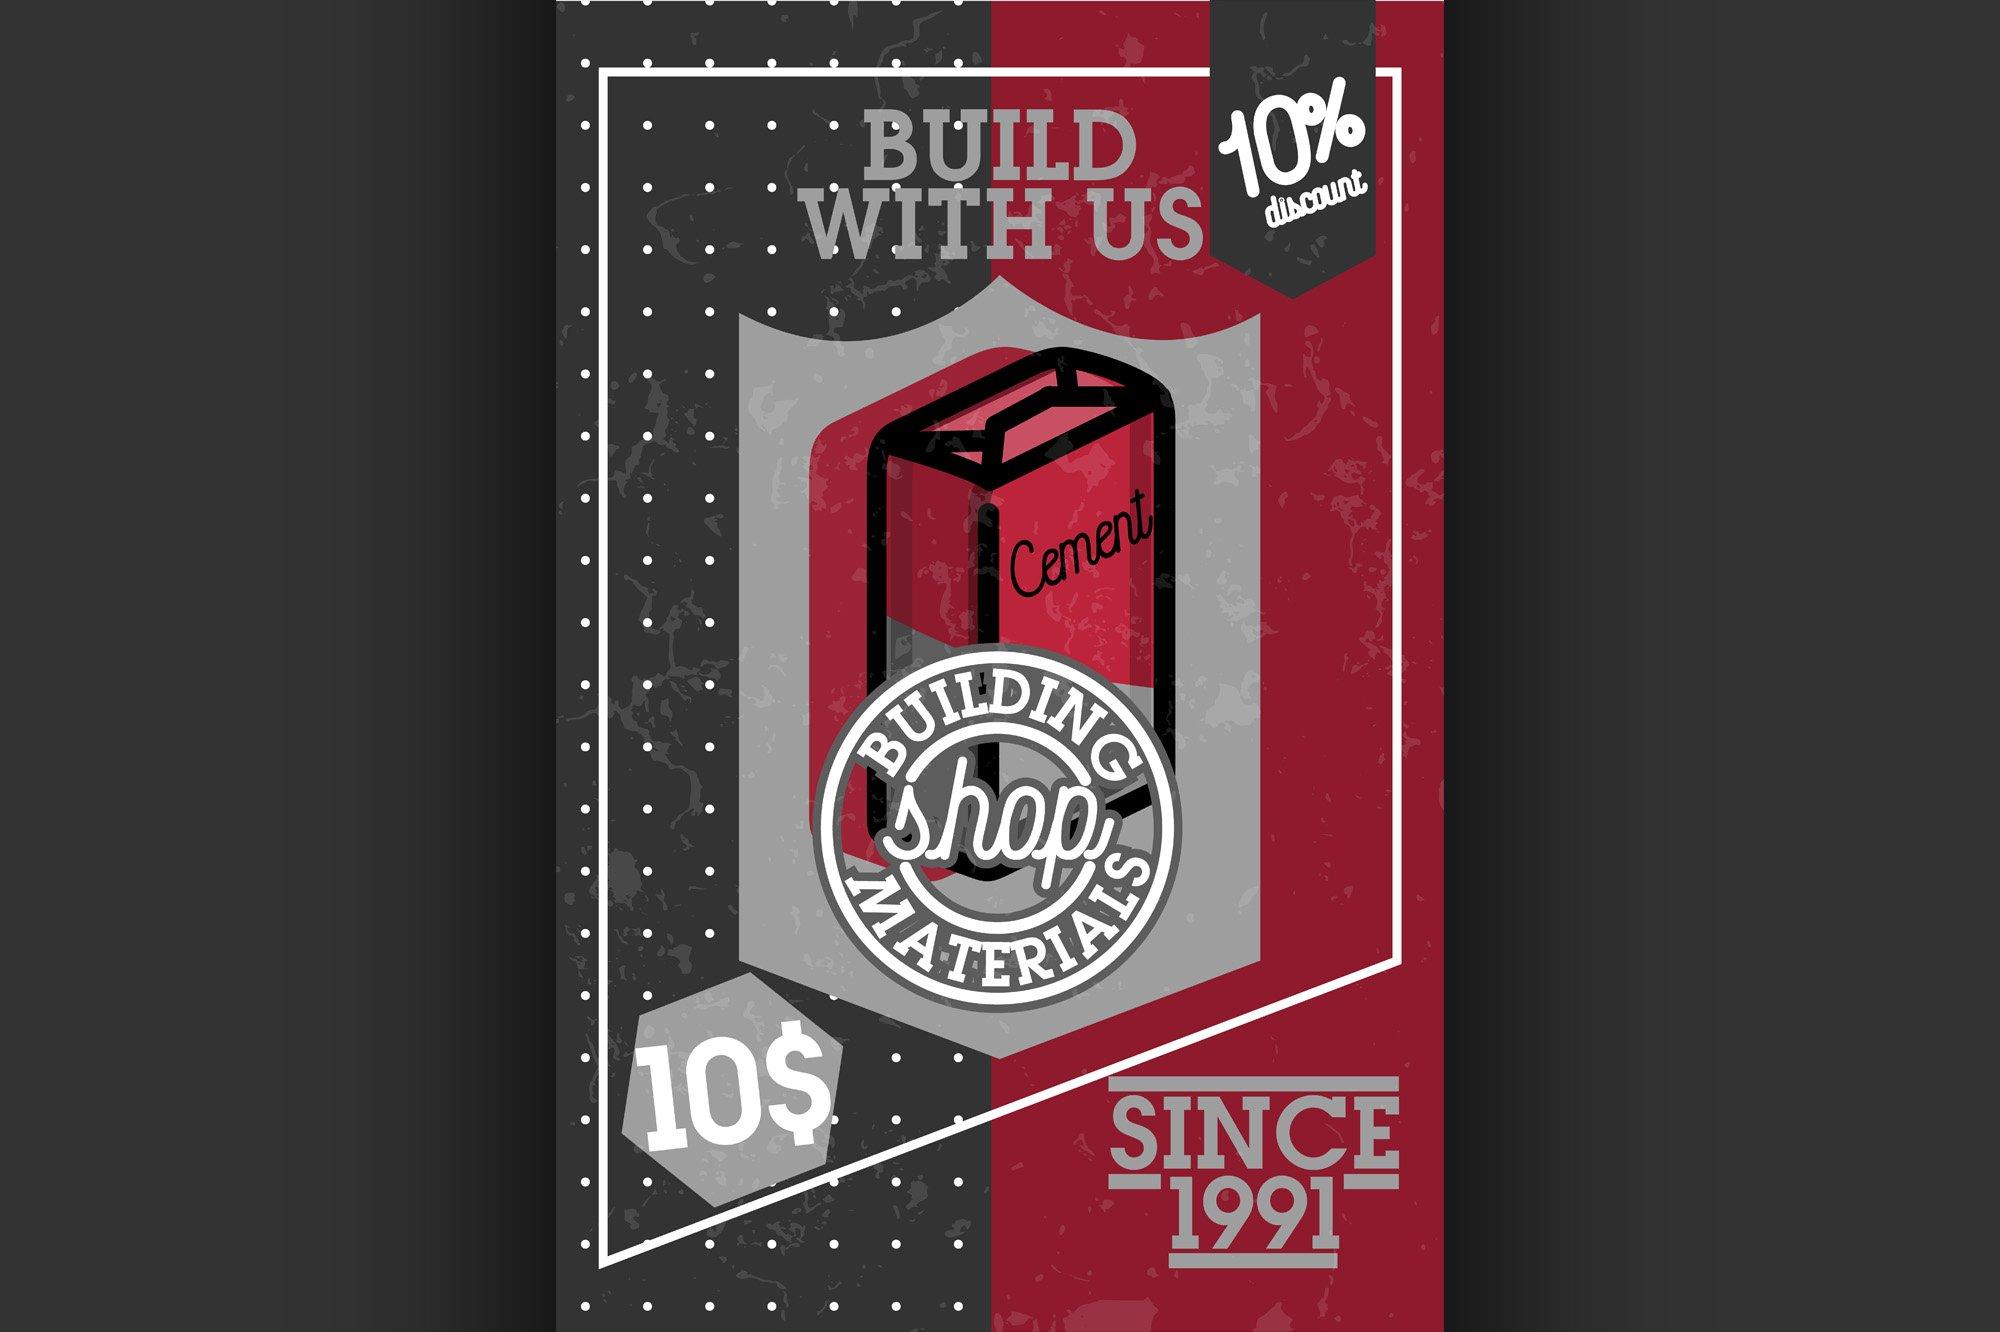 Color vintage building materials shop banner example image 1